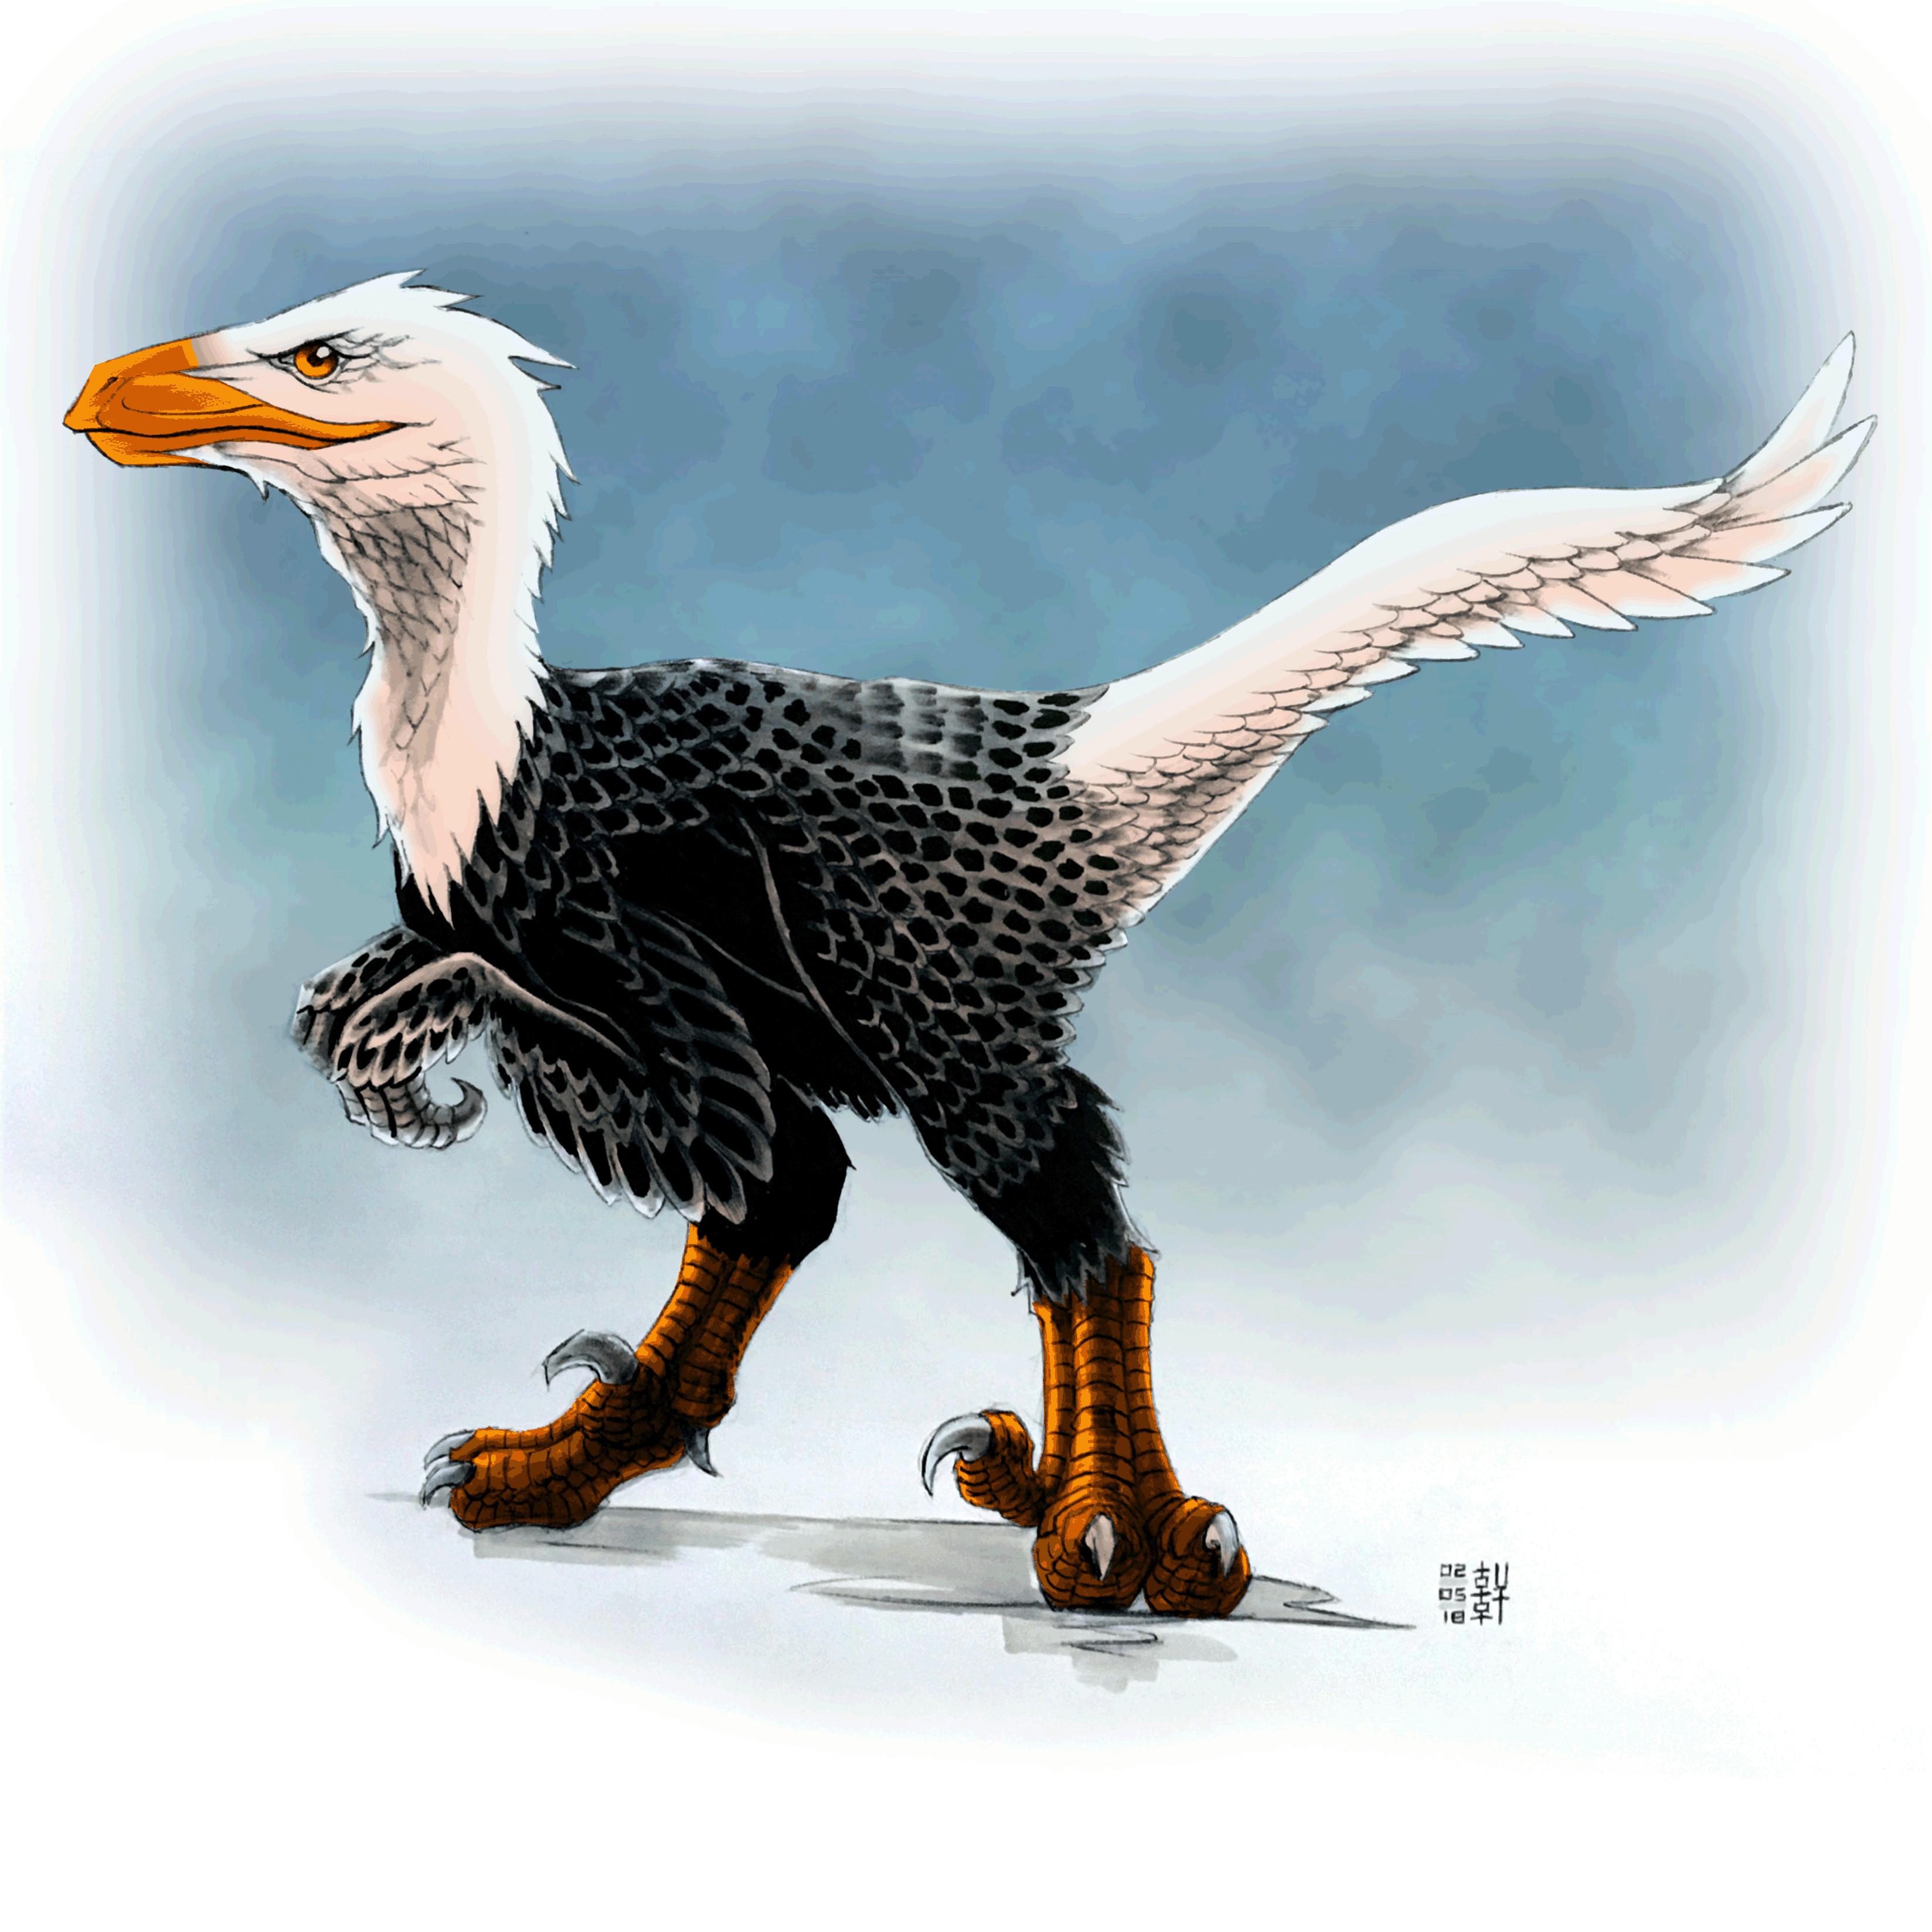 Day #15,138 - Feathered Utahraptor